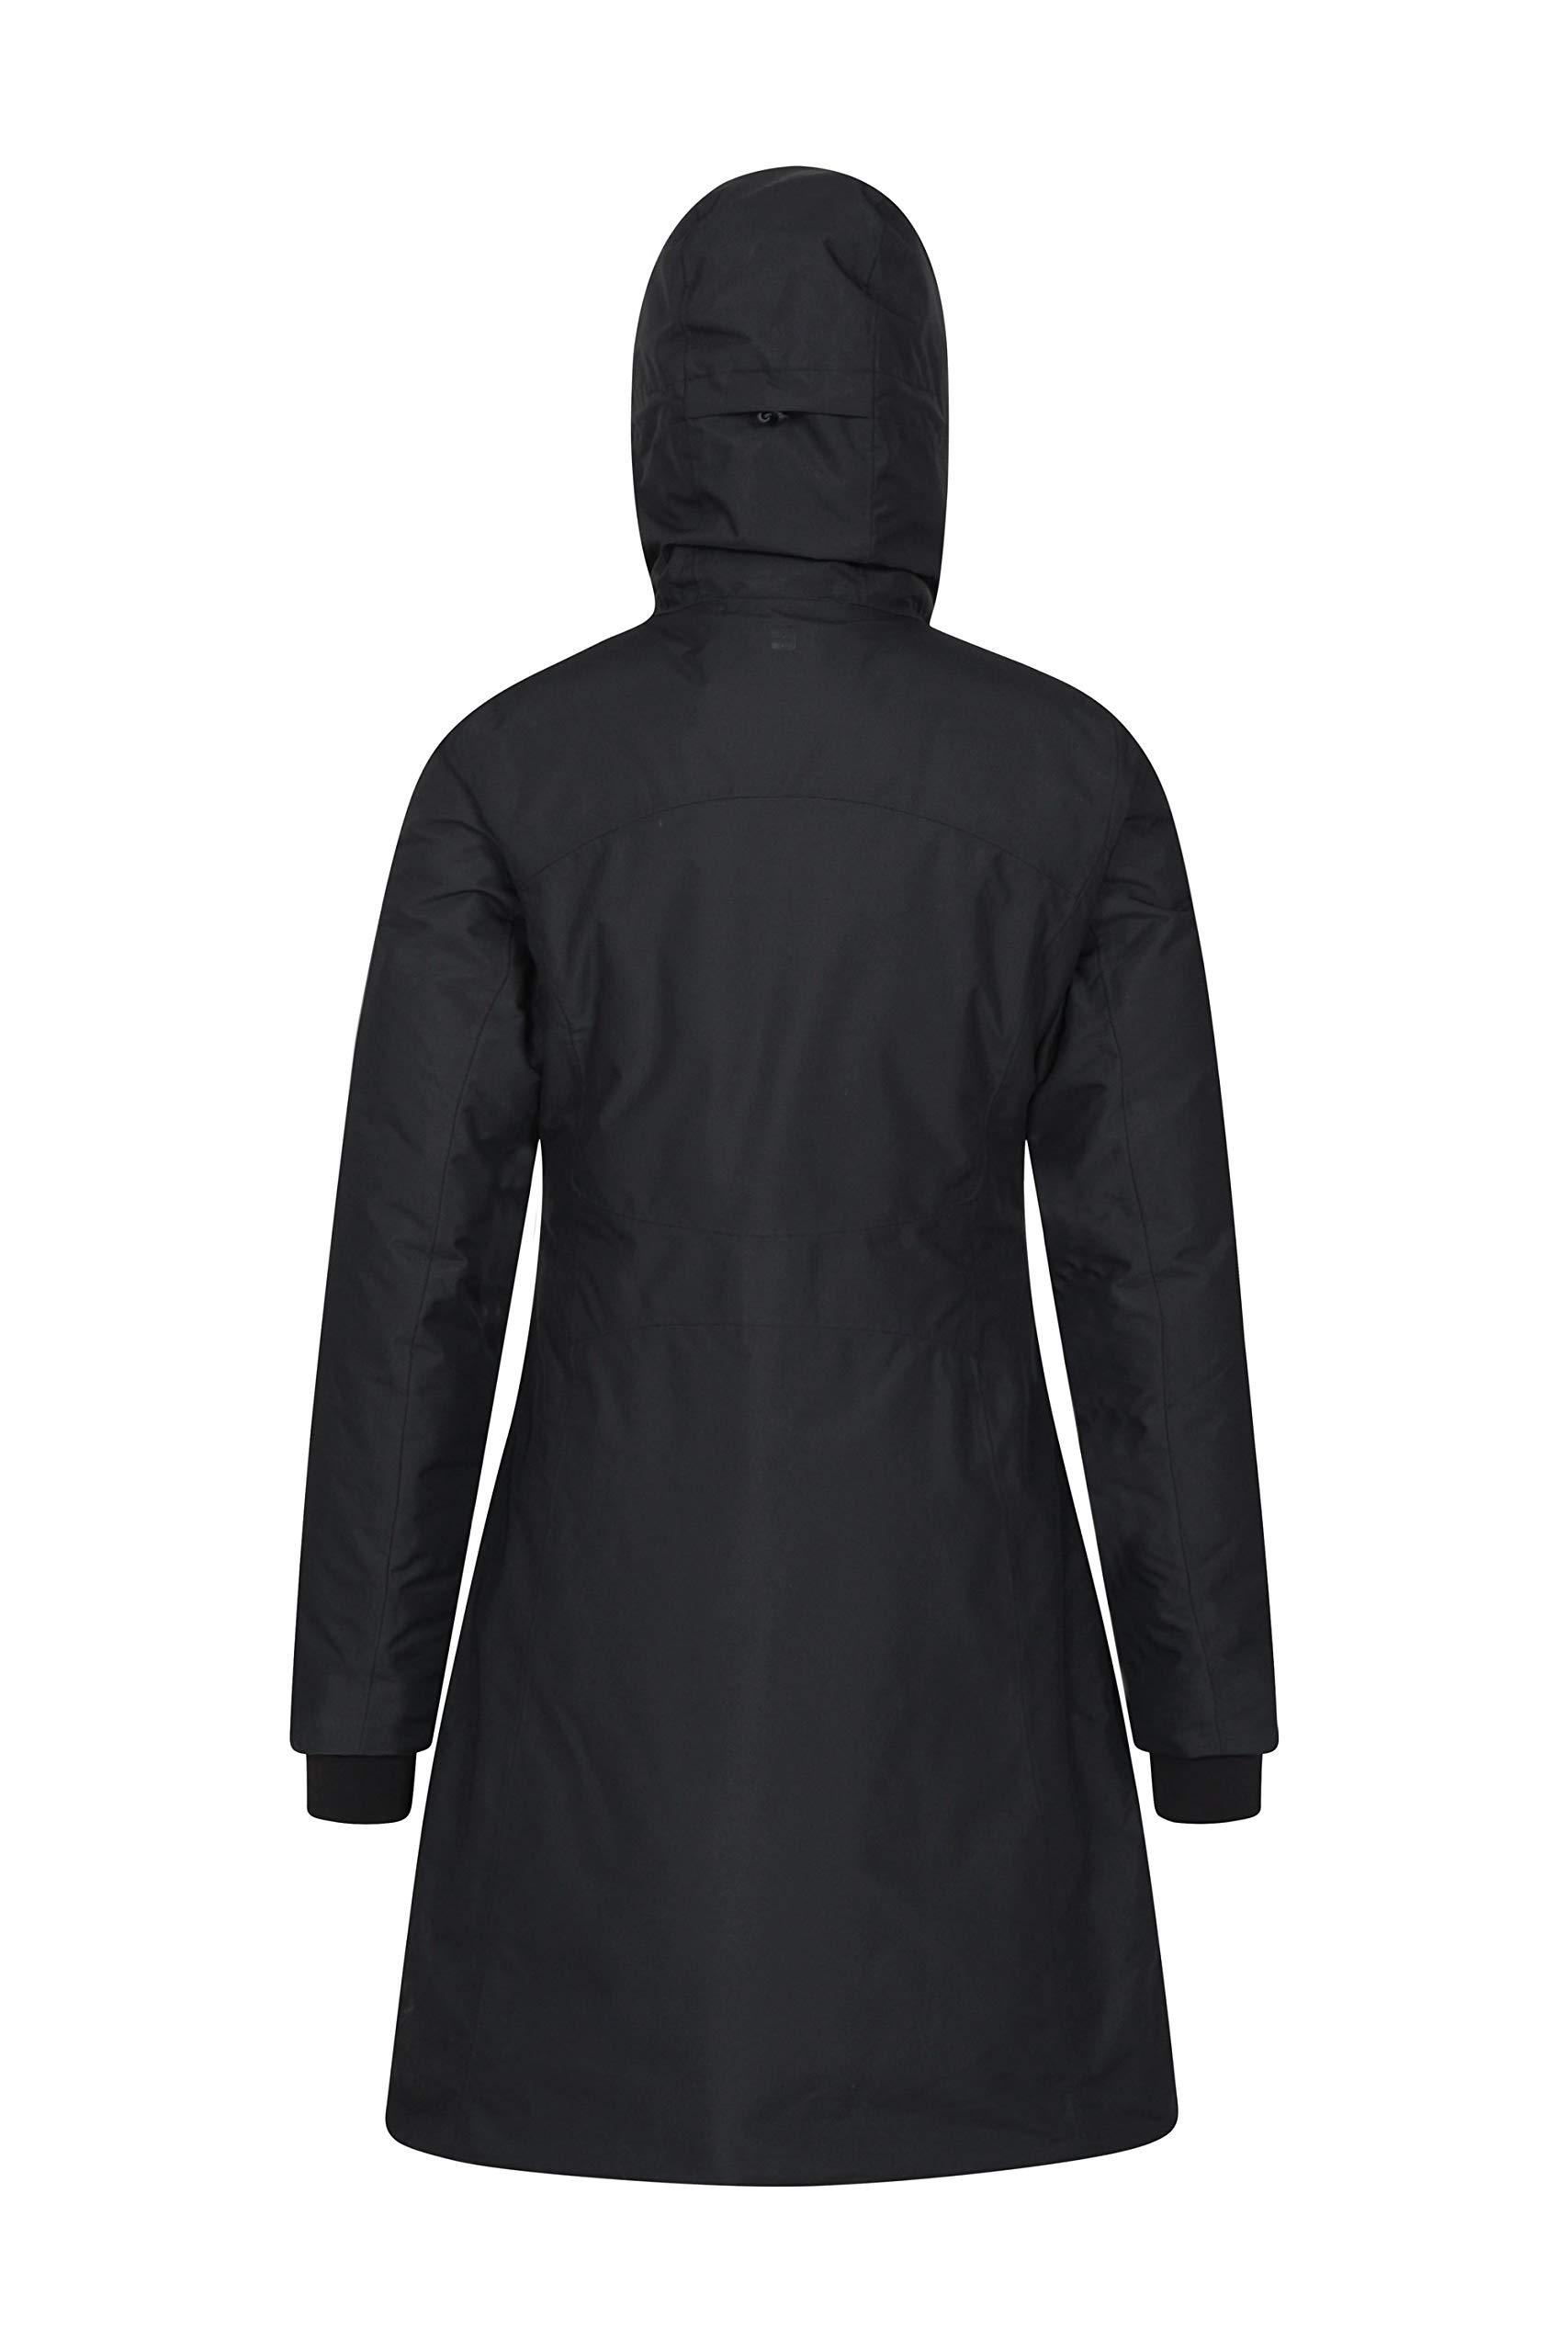 Mountain Warehouse Polar Womens Hybrid Long Padded Jacket – Waterproof Ladies Winter Coat, Breathable, Taped Seams…